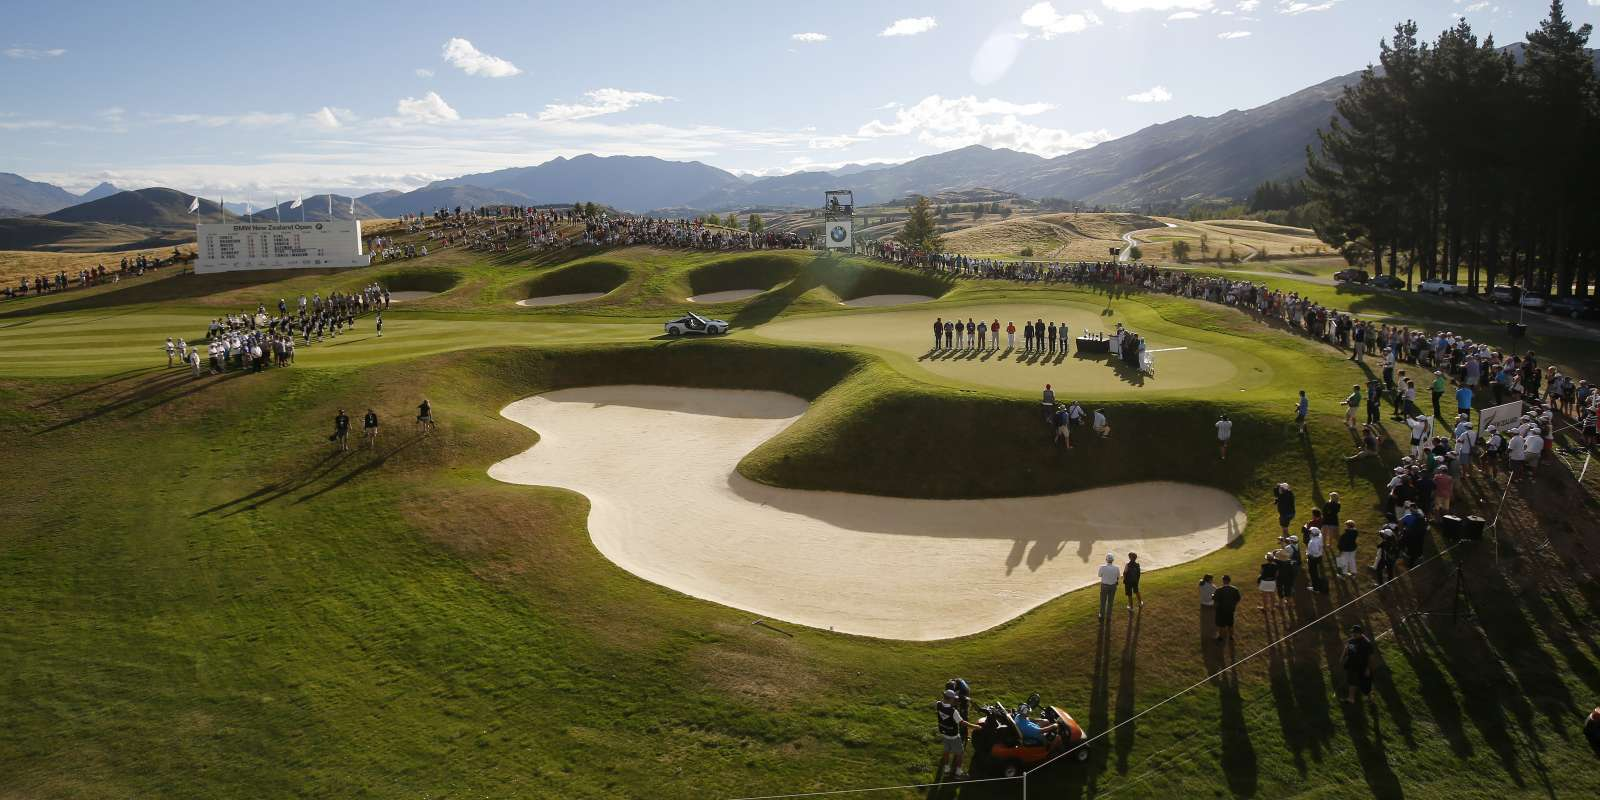 ew Zealand Golf Open 2018